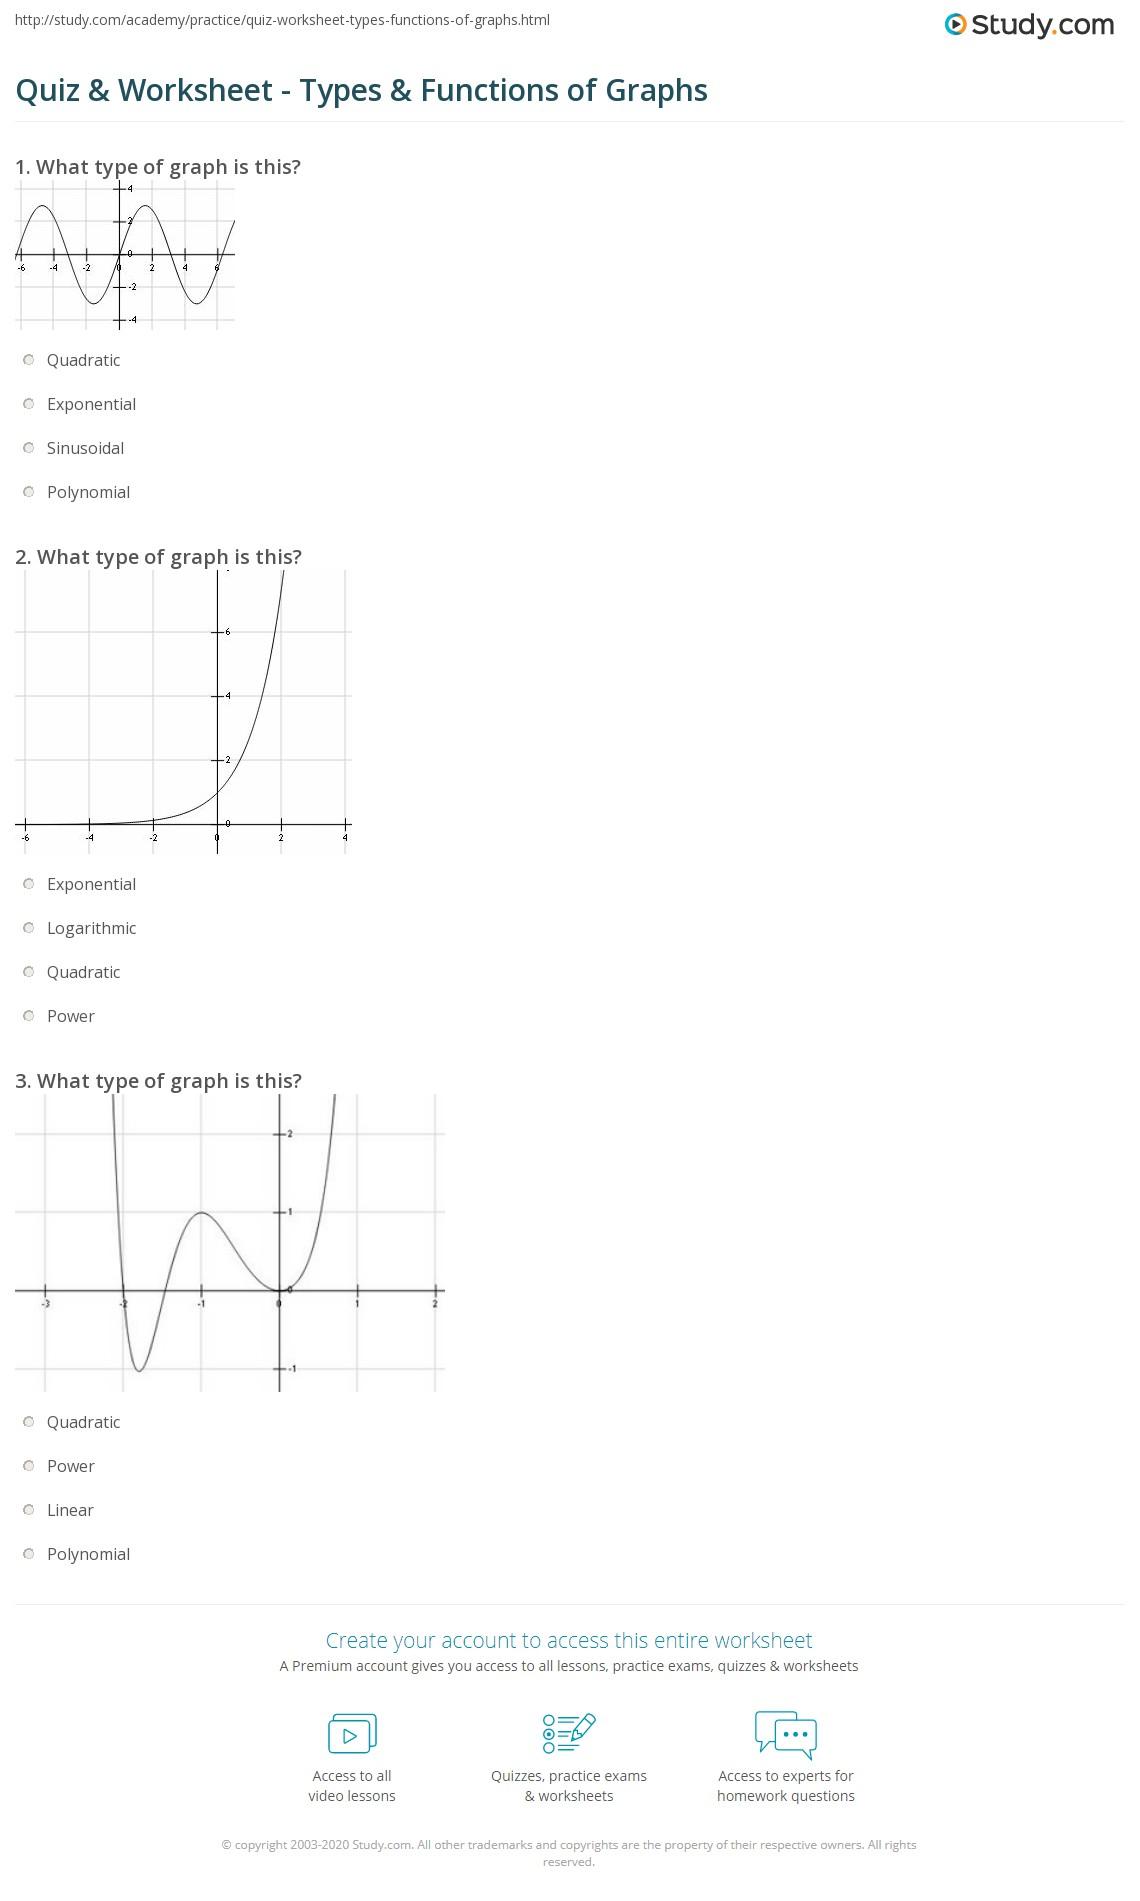 Quiz W Ksheet Types Functi S Of Gr Phs Study